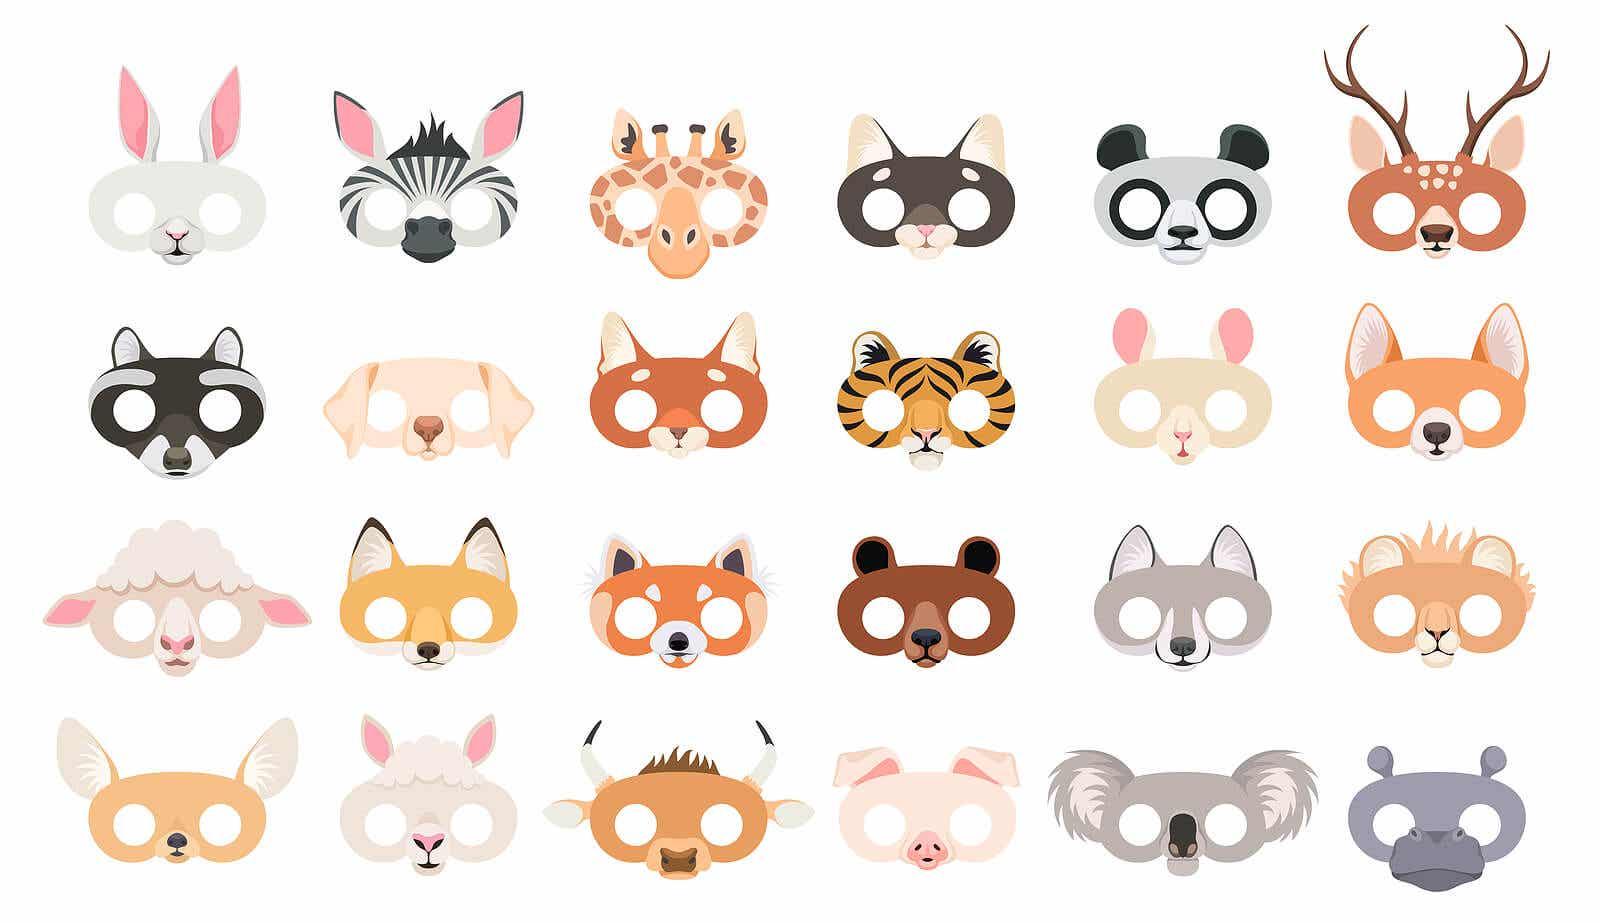 A variety of animal masks.